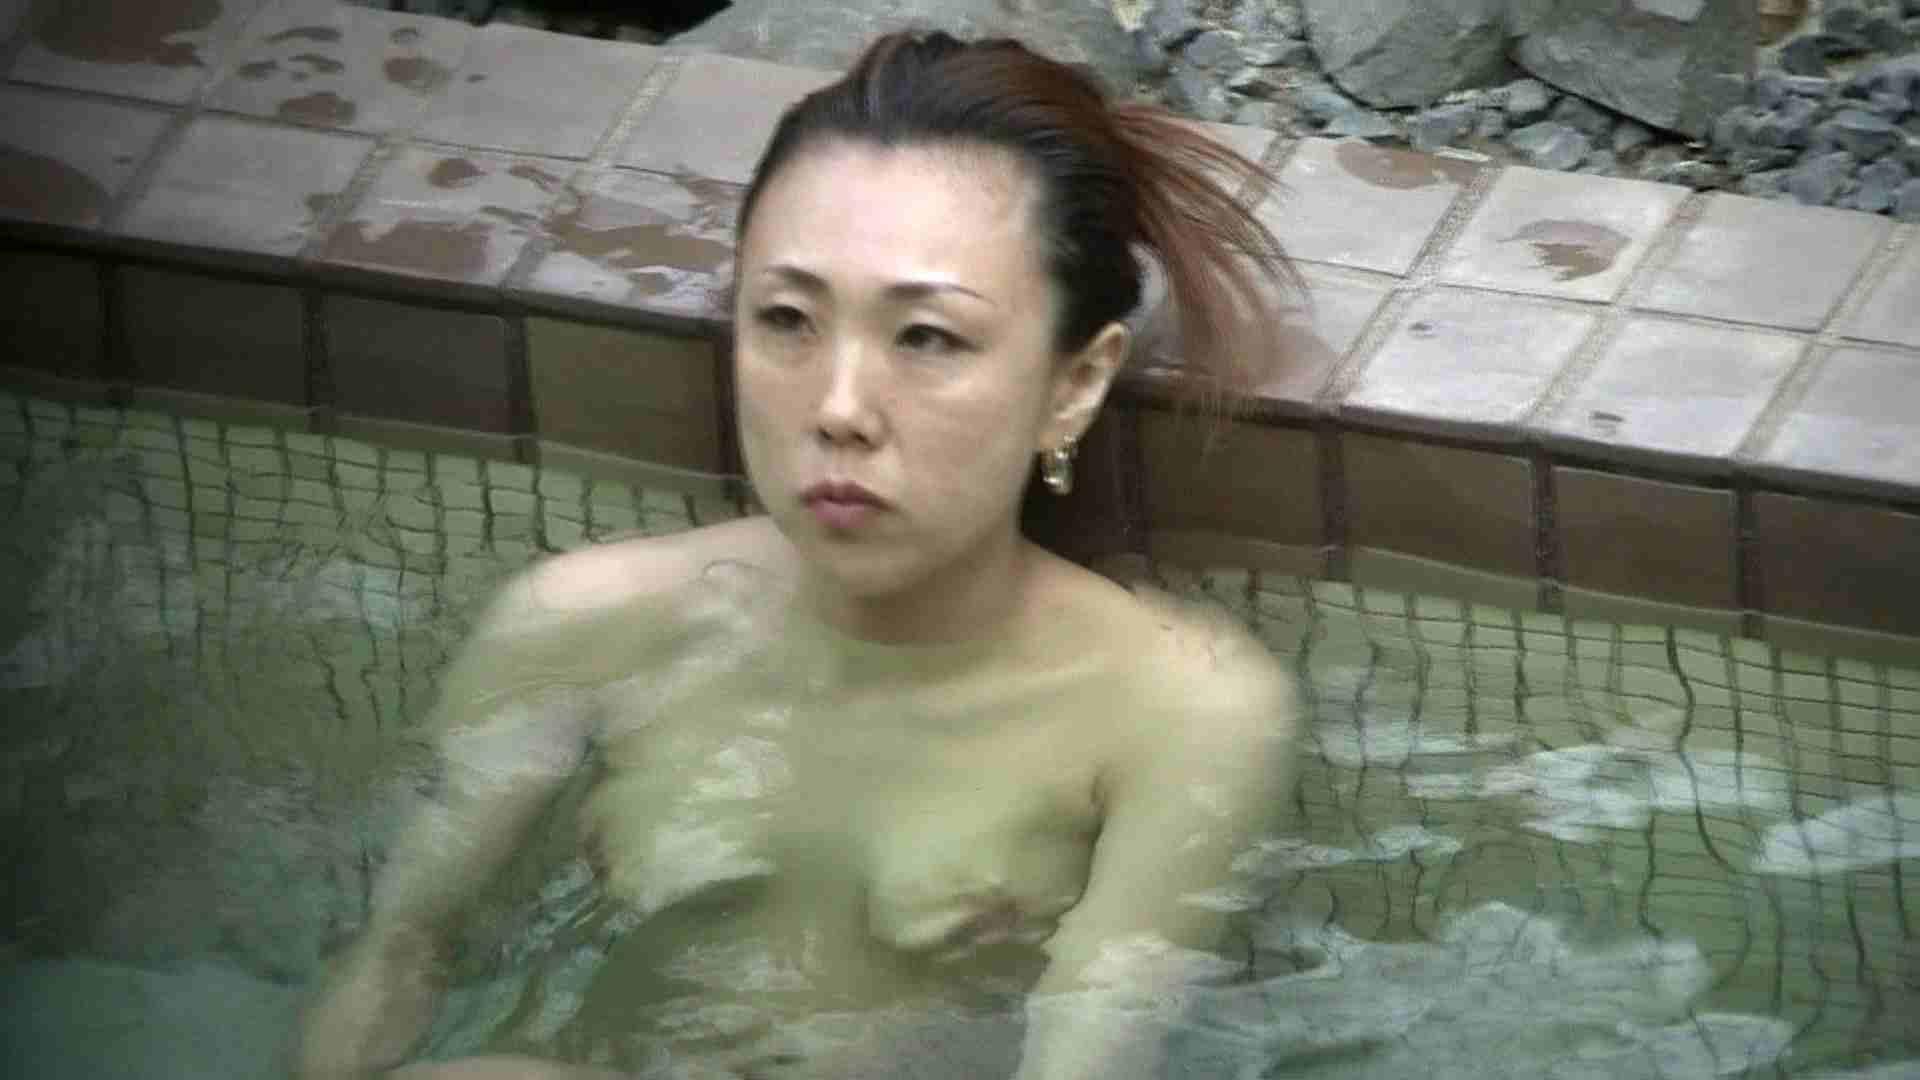 Aquaな露天風呂Vol.654 OLすけべ画像   盗撮  38連発 16